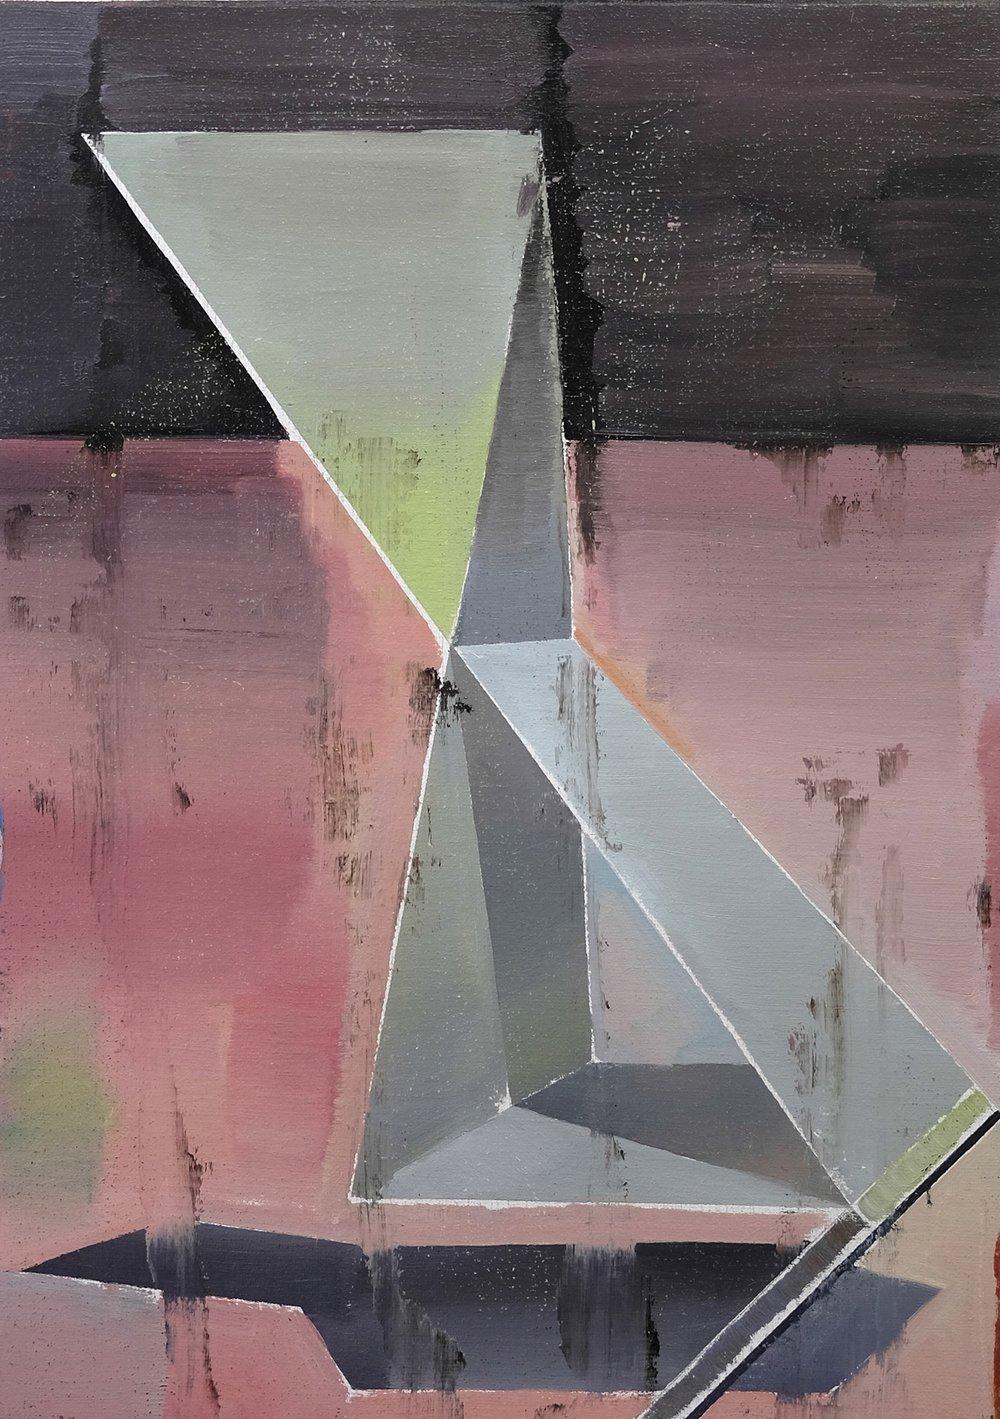 Genti Korini: Structure Nr. 27, 2017